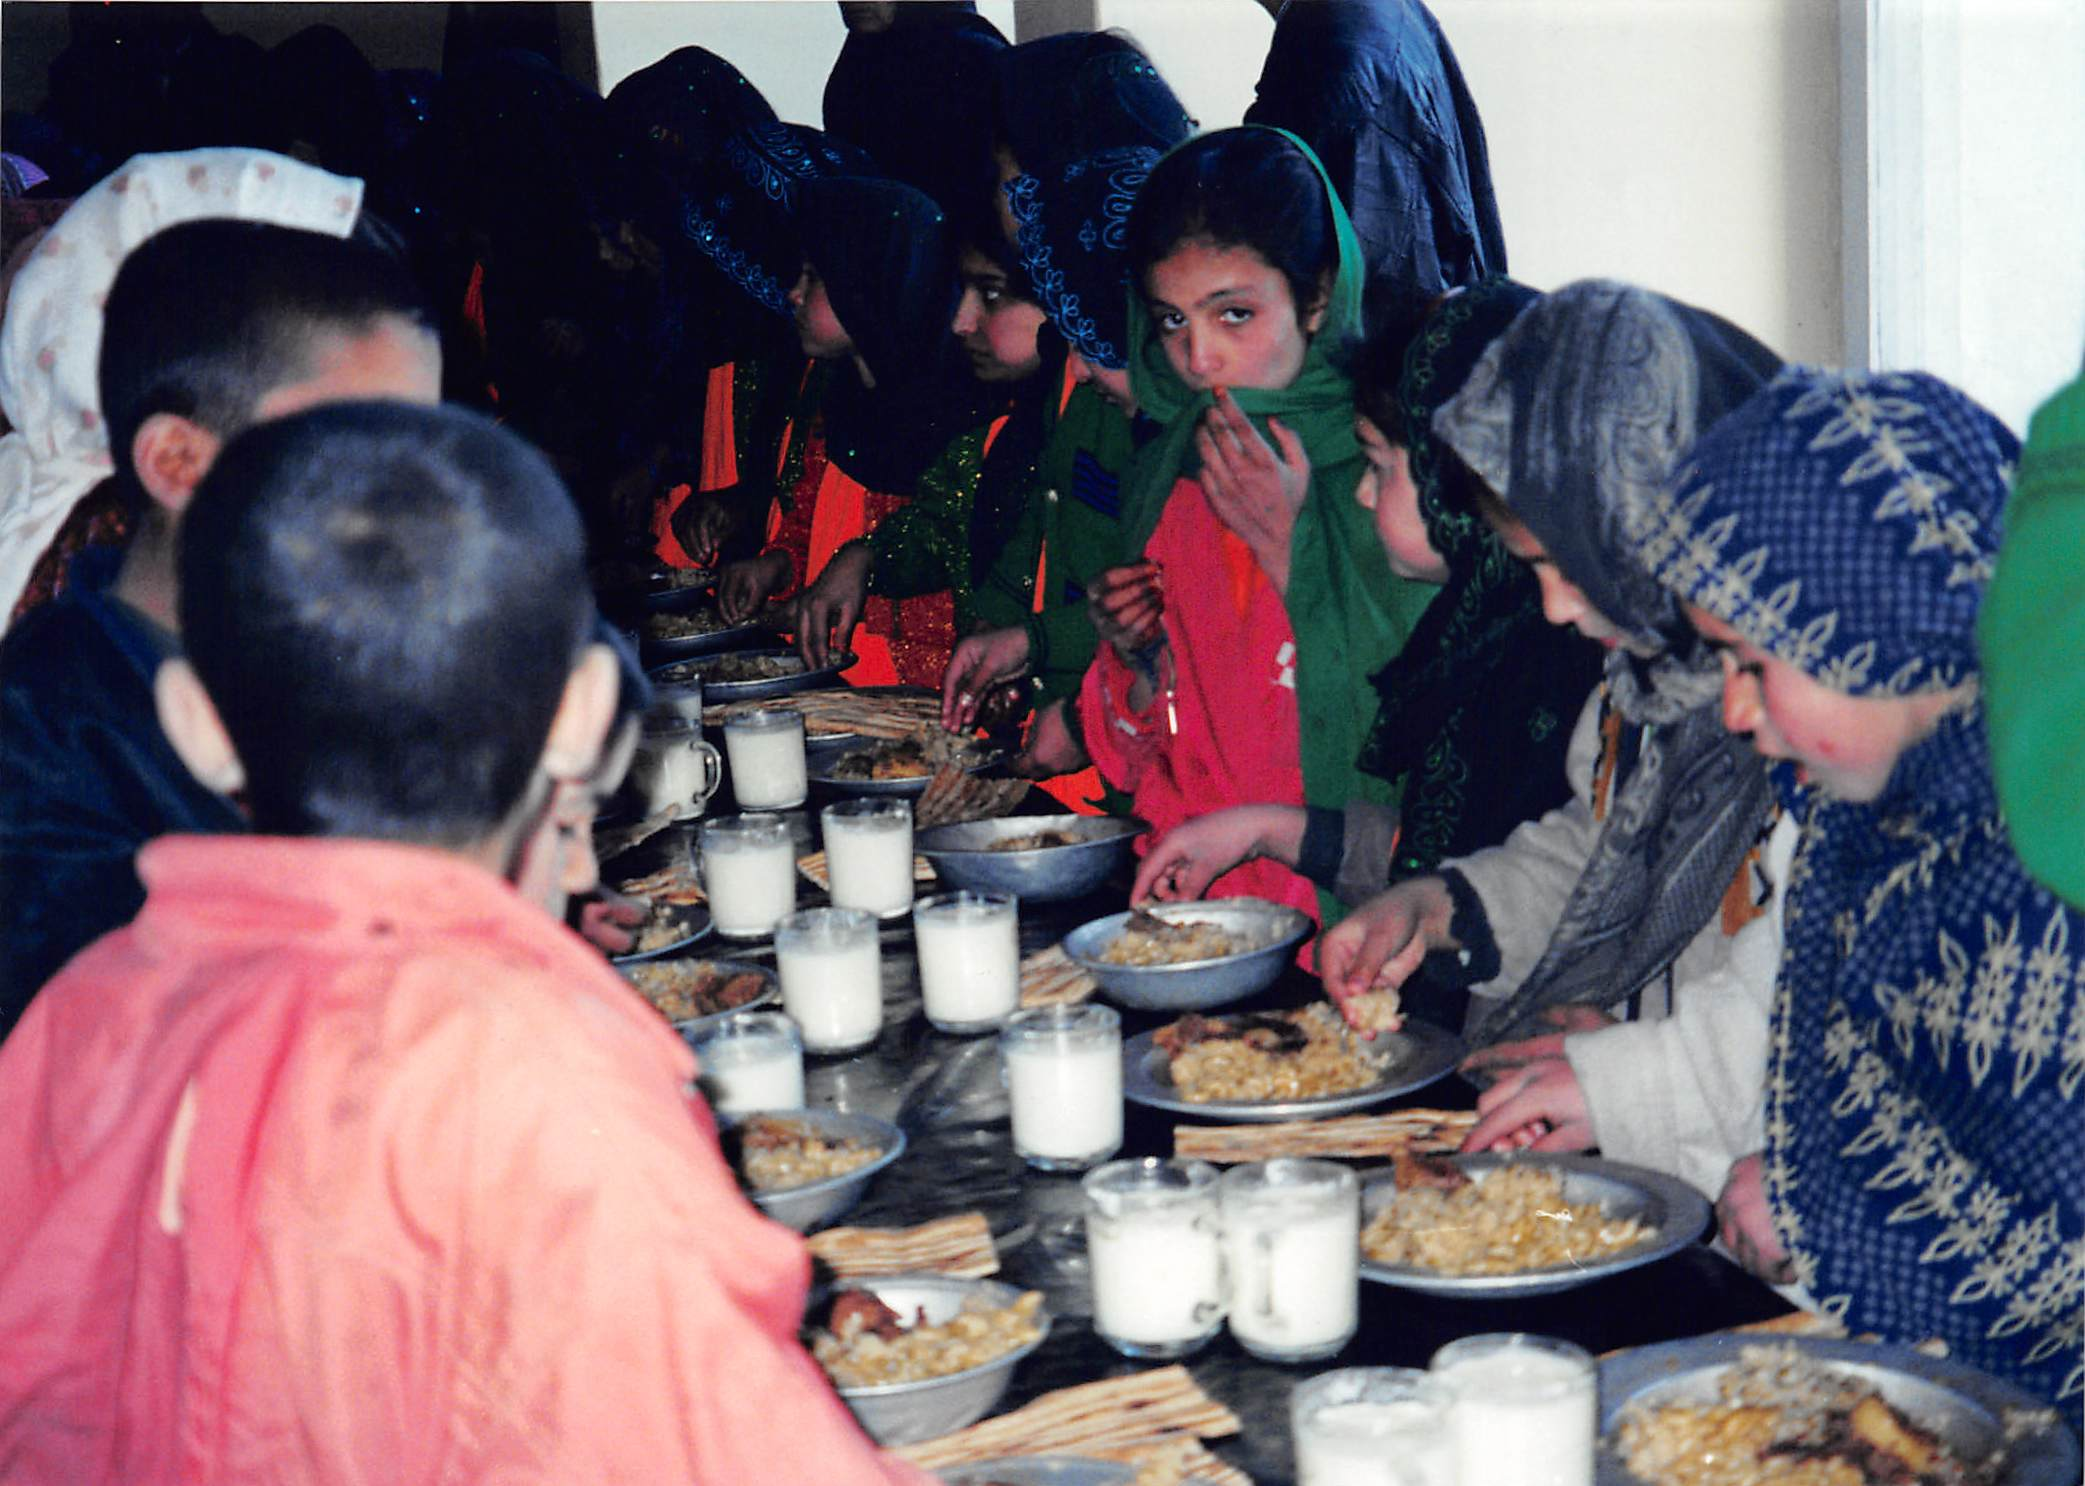 Afghanistan 2002 (Photo by Gawaher Atif)